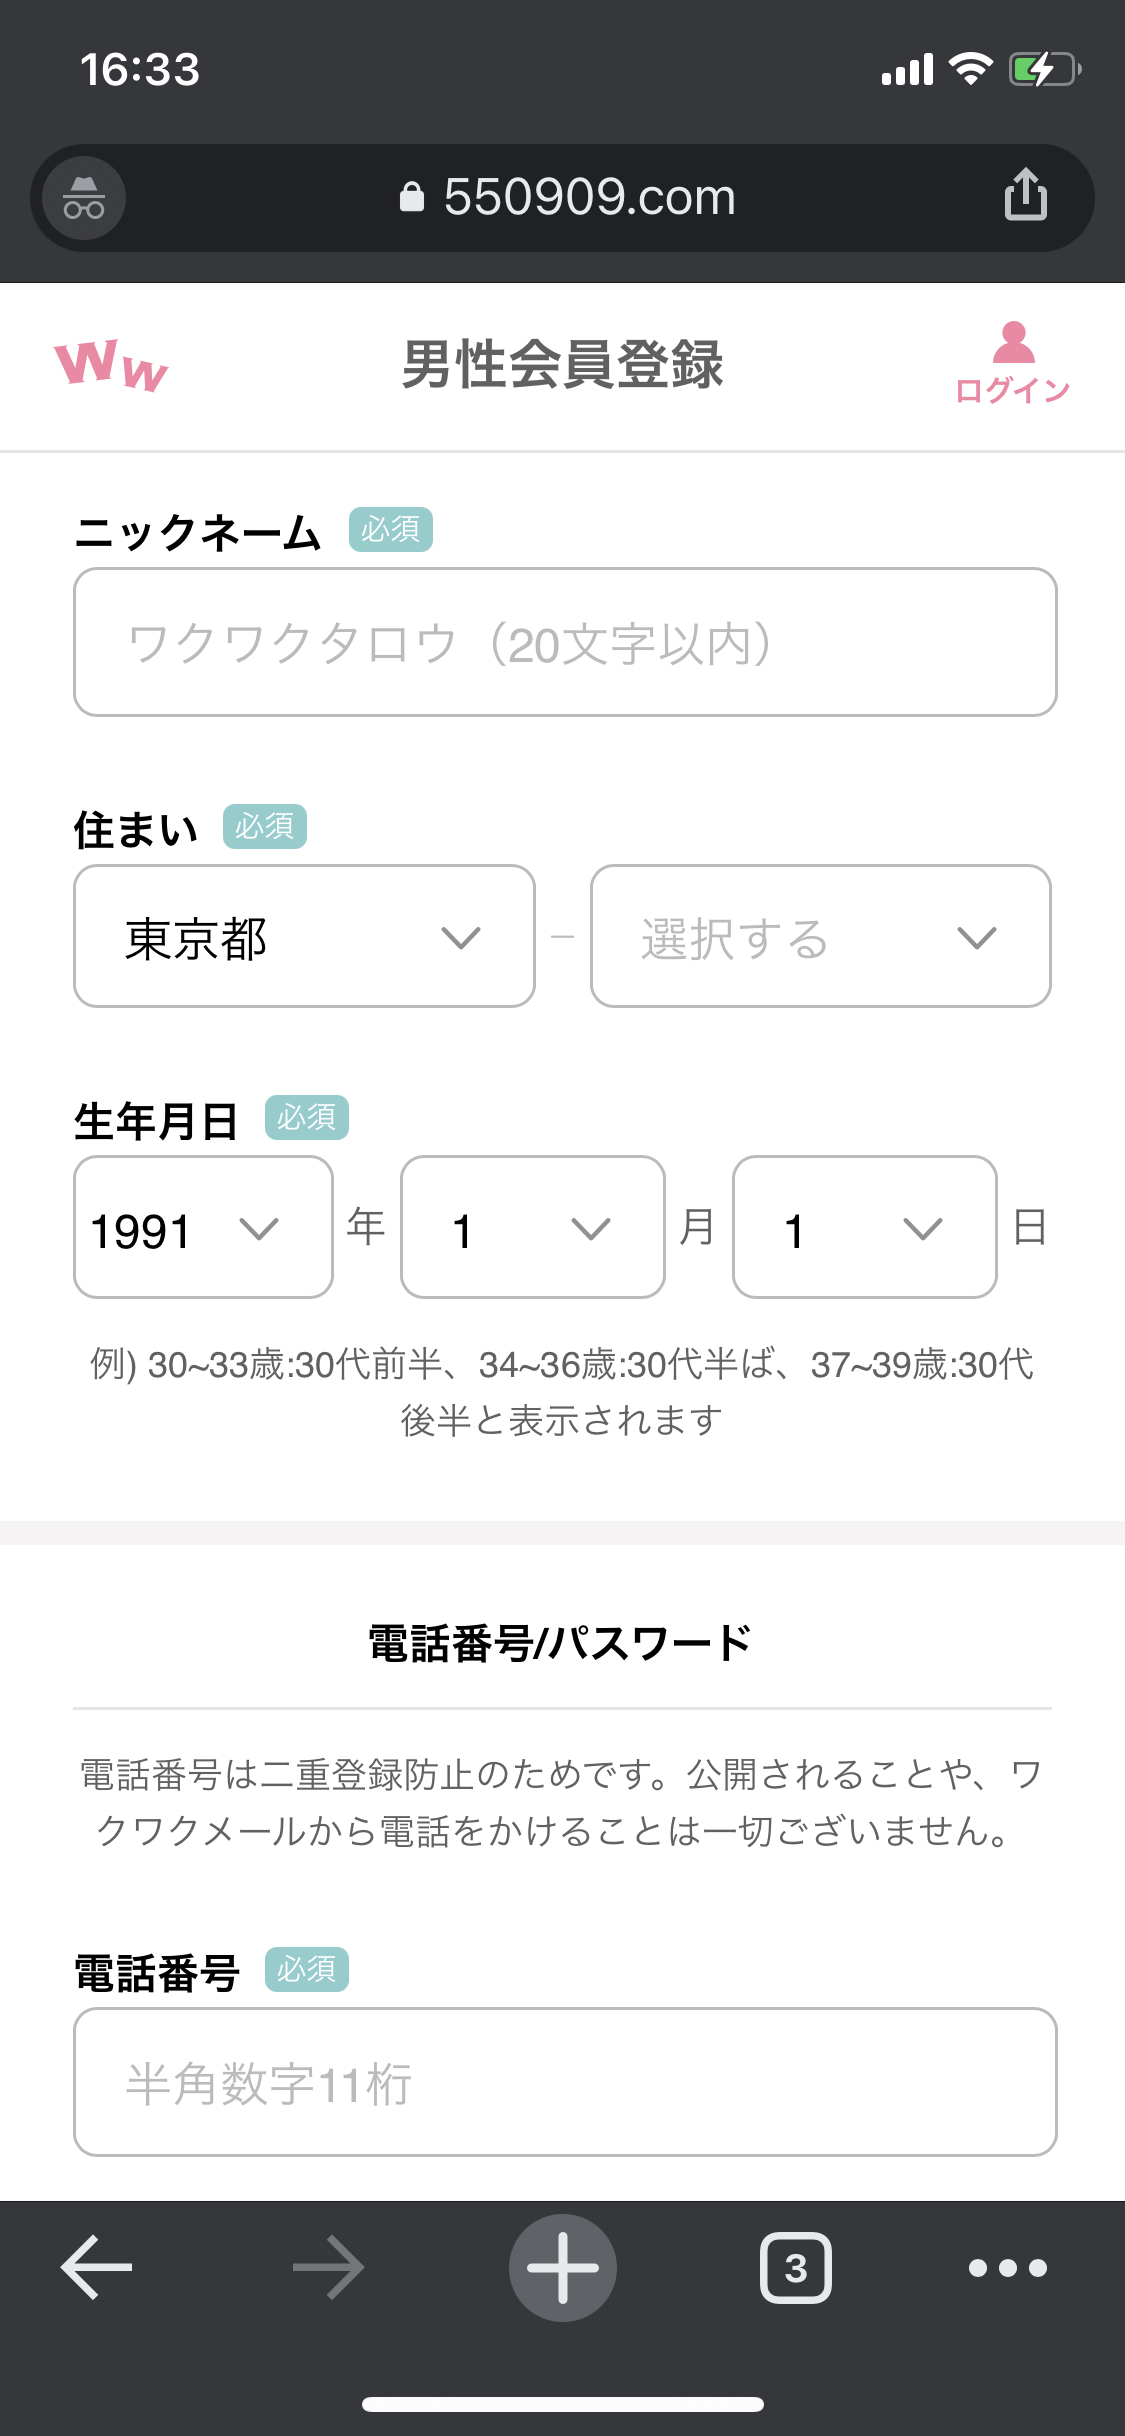 IMG_ABF1D9F4C6EB-1